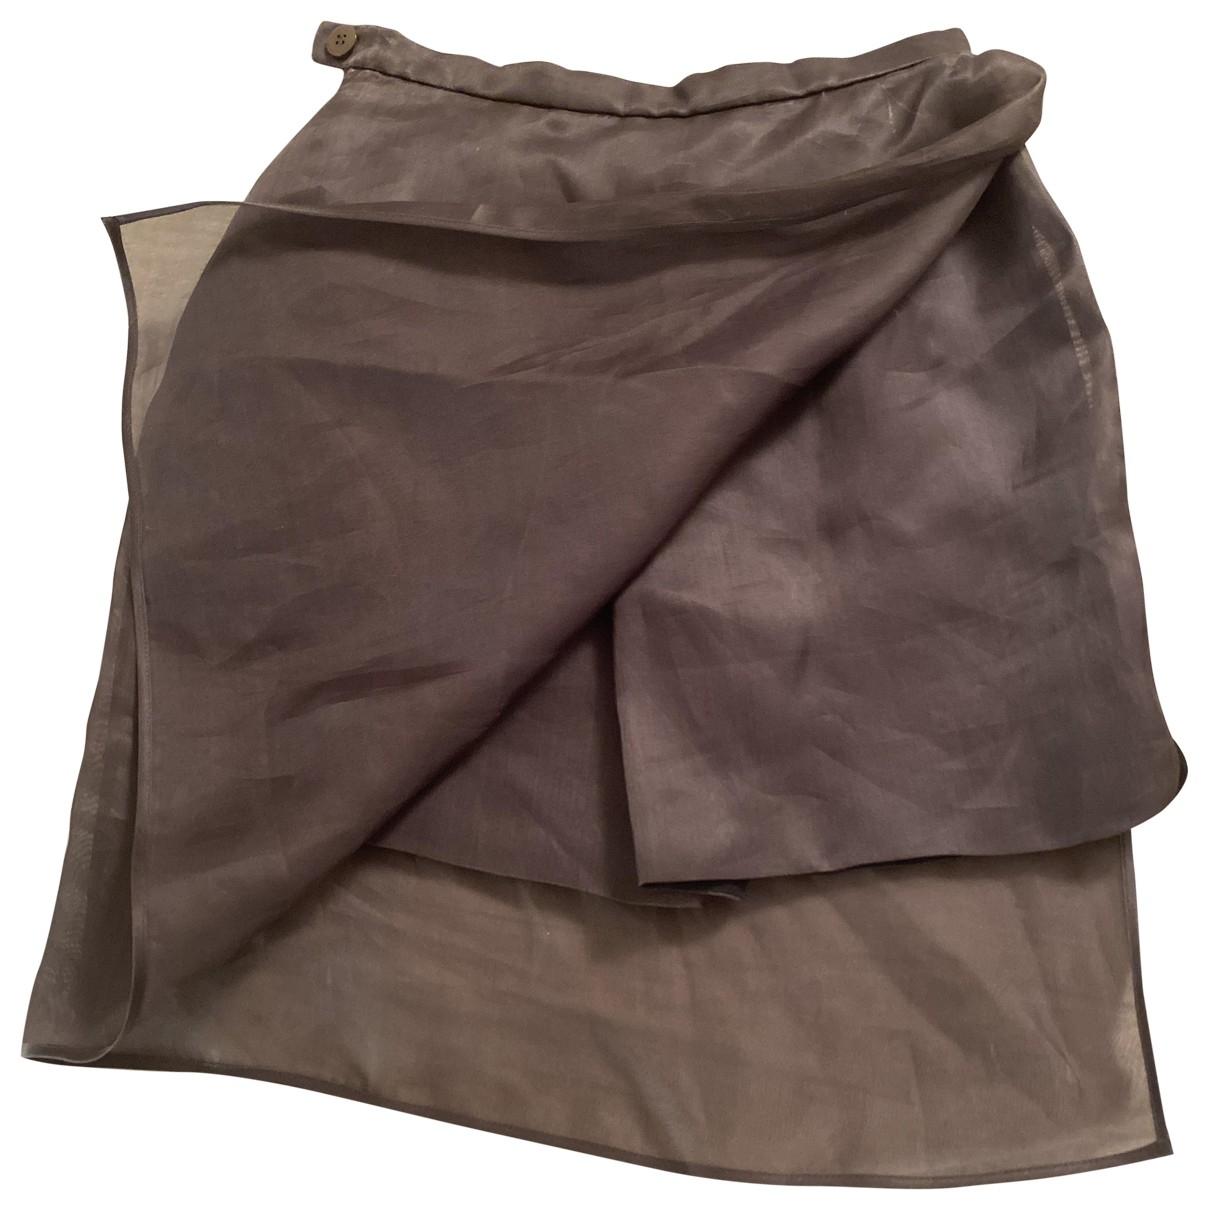 Giorgio Armani - Jupe   pour femme en soie - marron